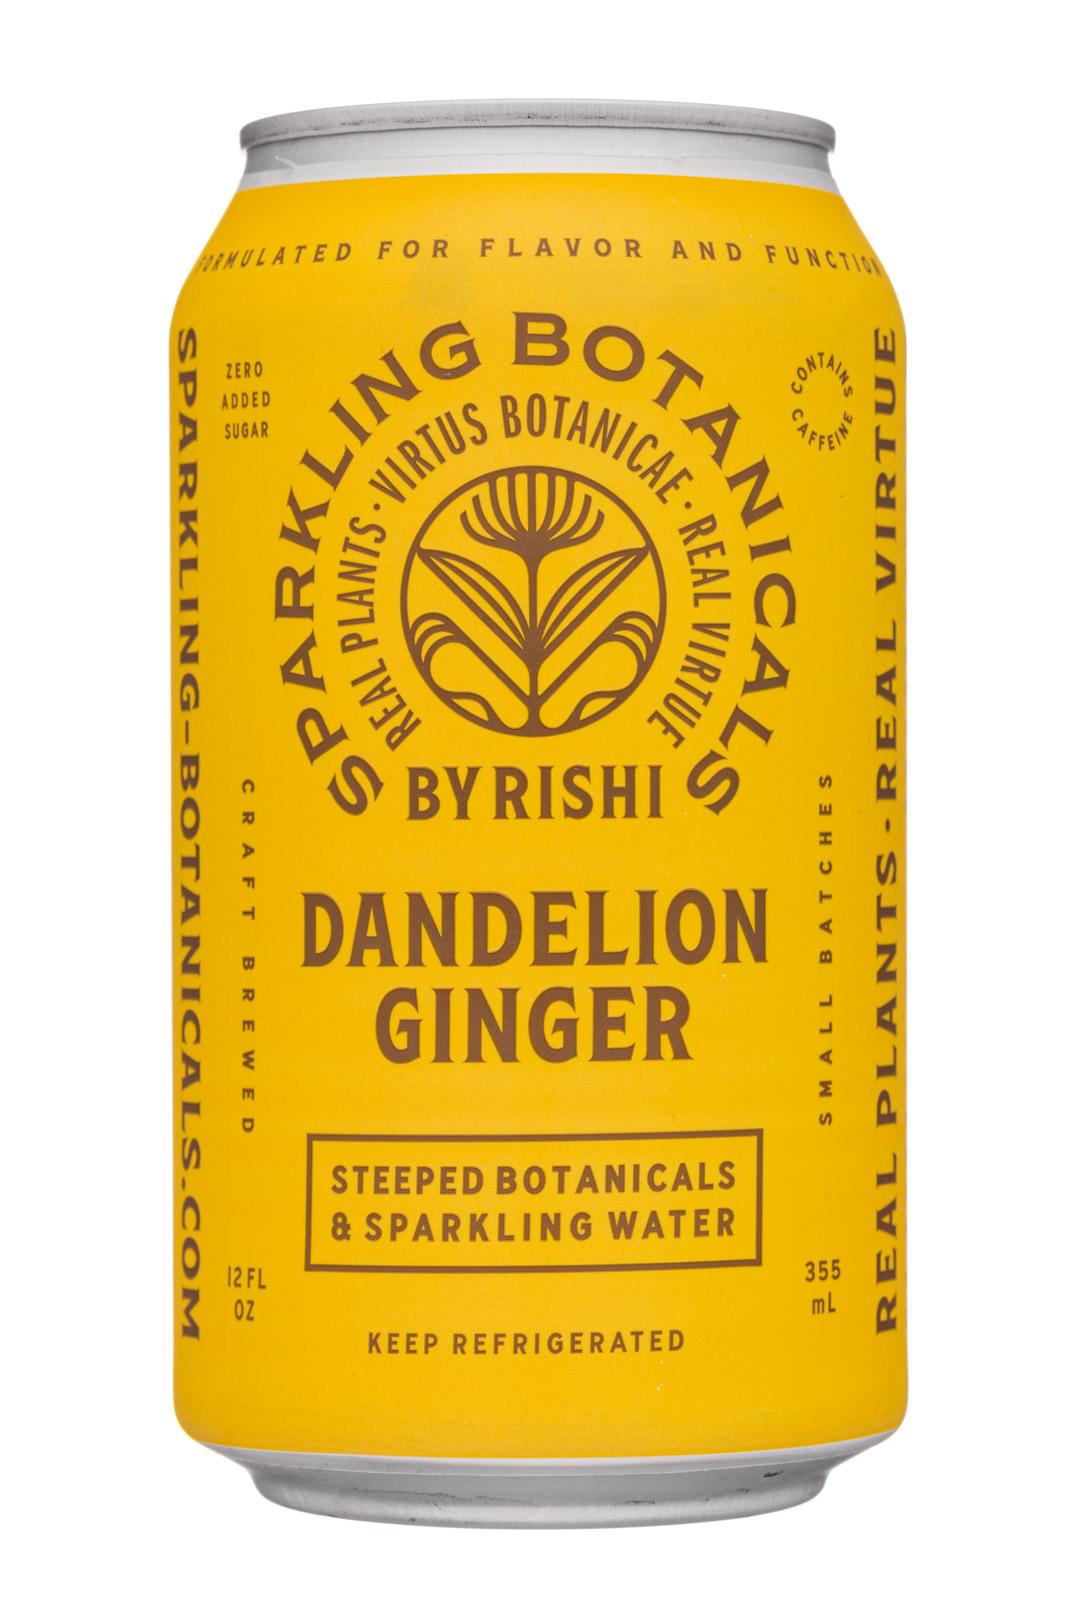 Sparkling Botanicals By Rishi: Rishi-12oz-2020-SparklingBotanicals-DandelionGinger-Front